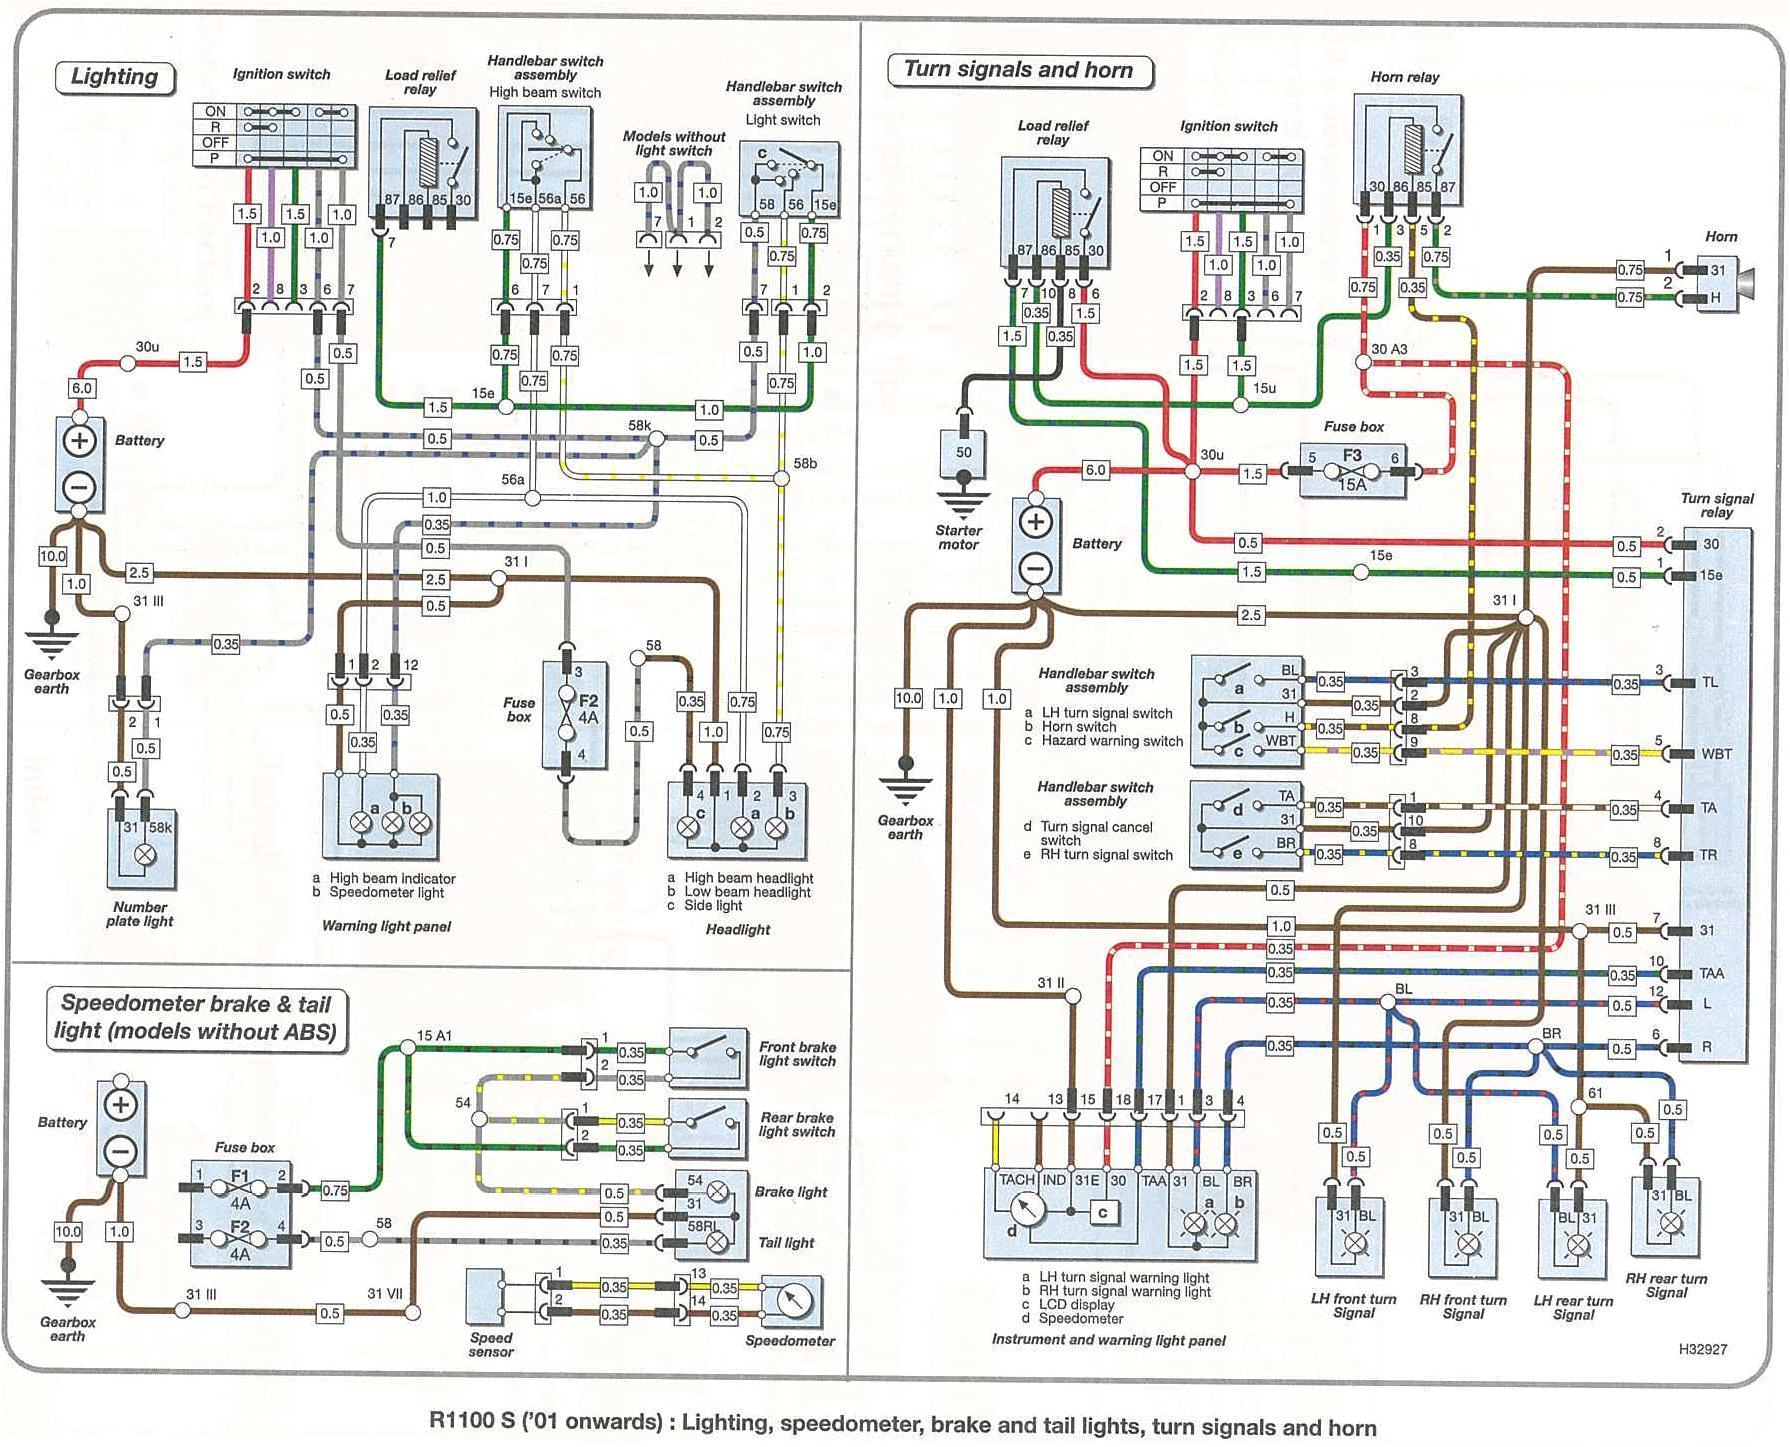 M38a1 Wiring Diagram E53 Fuse Box Auto Electrical Wiring Diagram